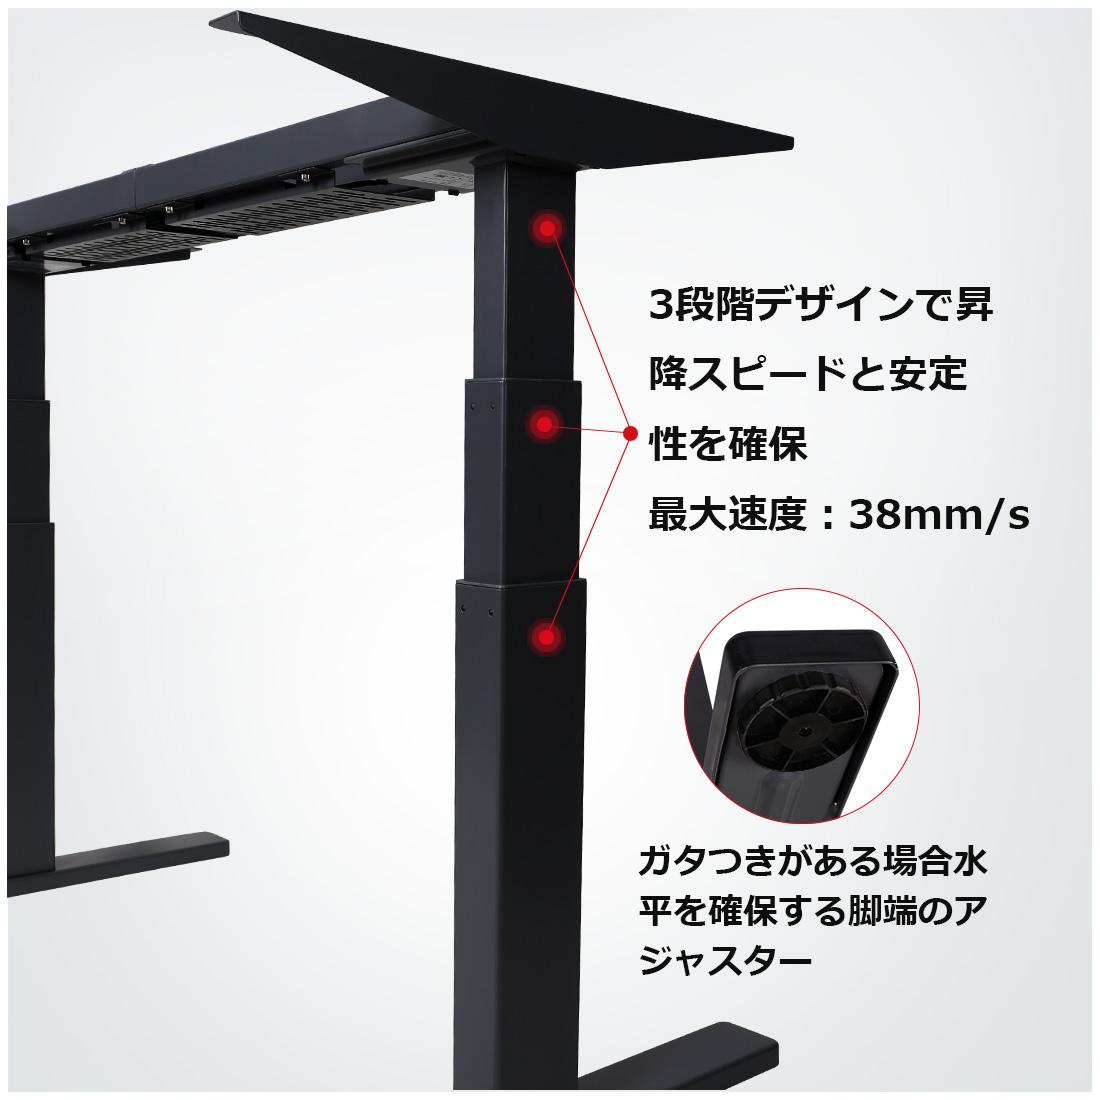 【Flexispot・JP】公式サインセール商品を公開